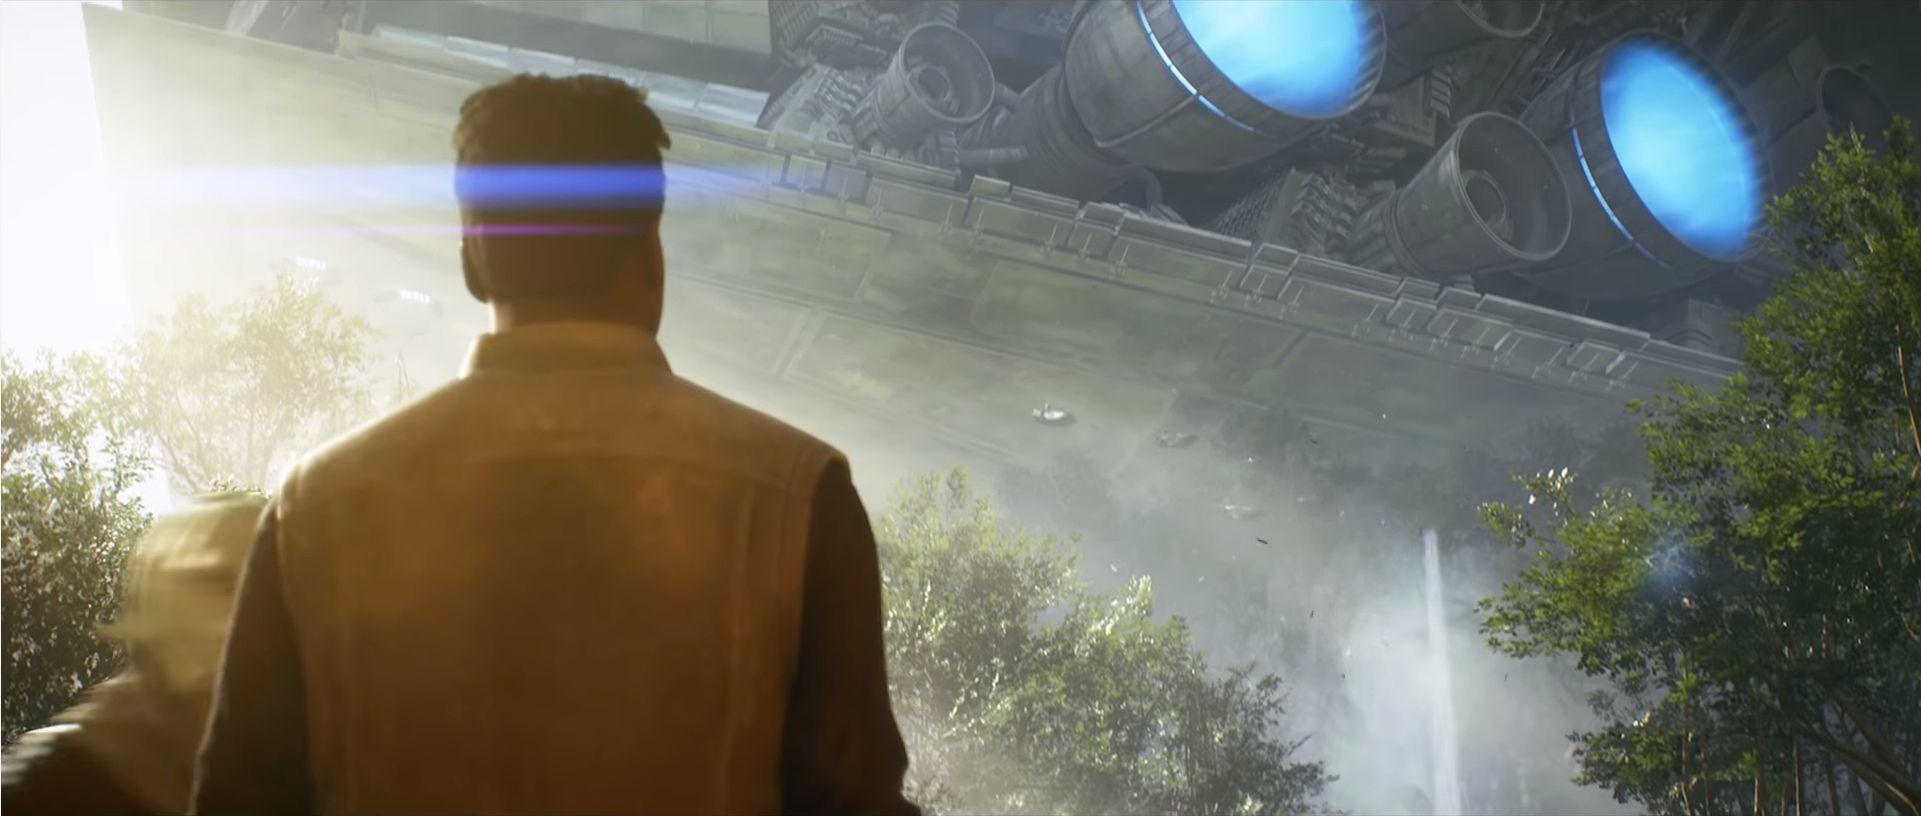 Fin | Battlefront II - Rise of the Skywalker